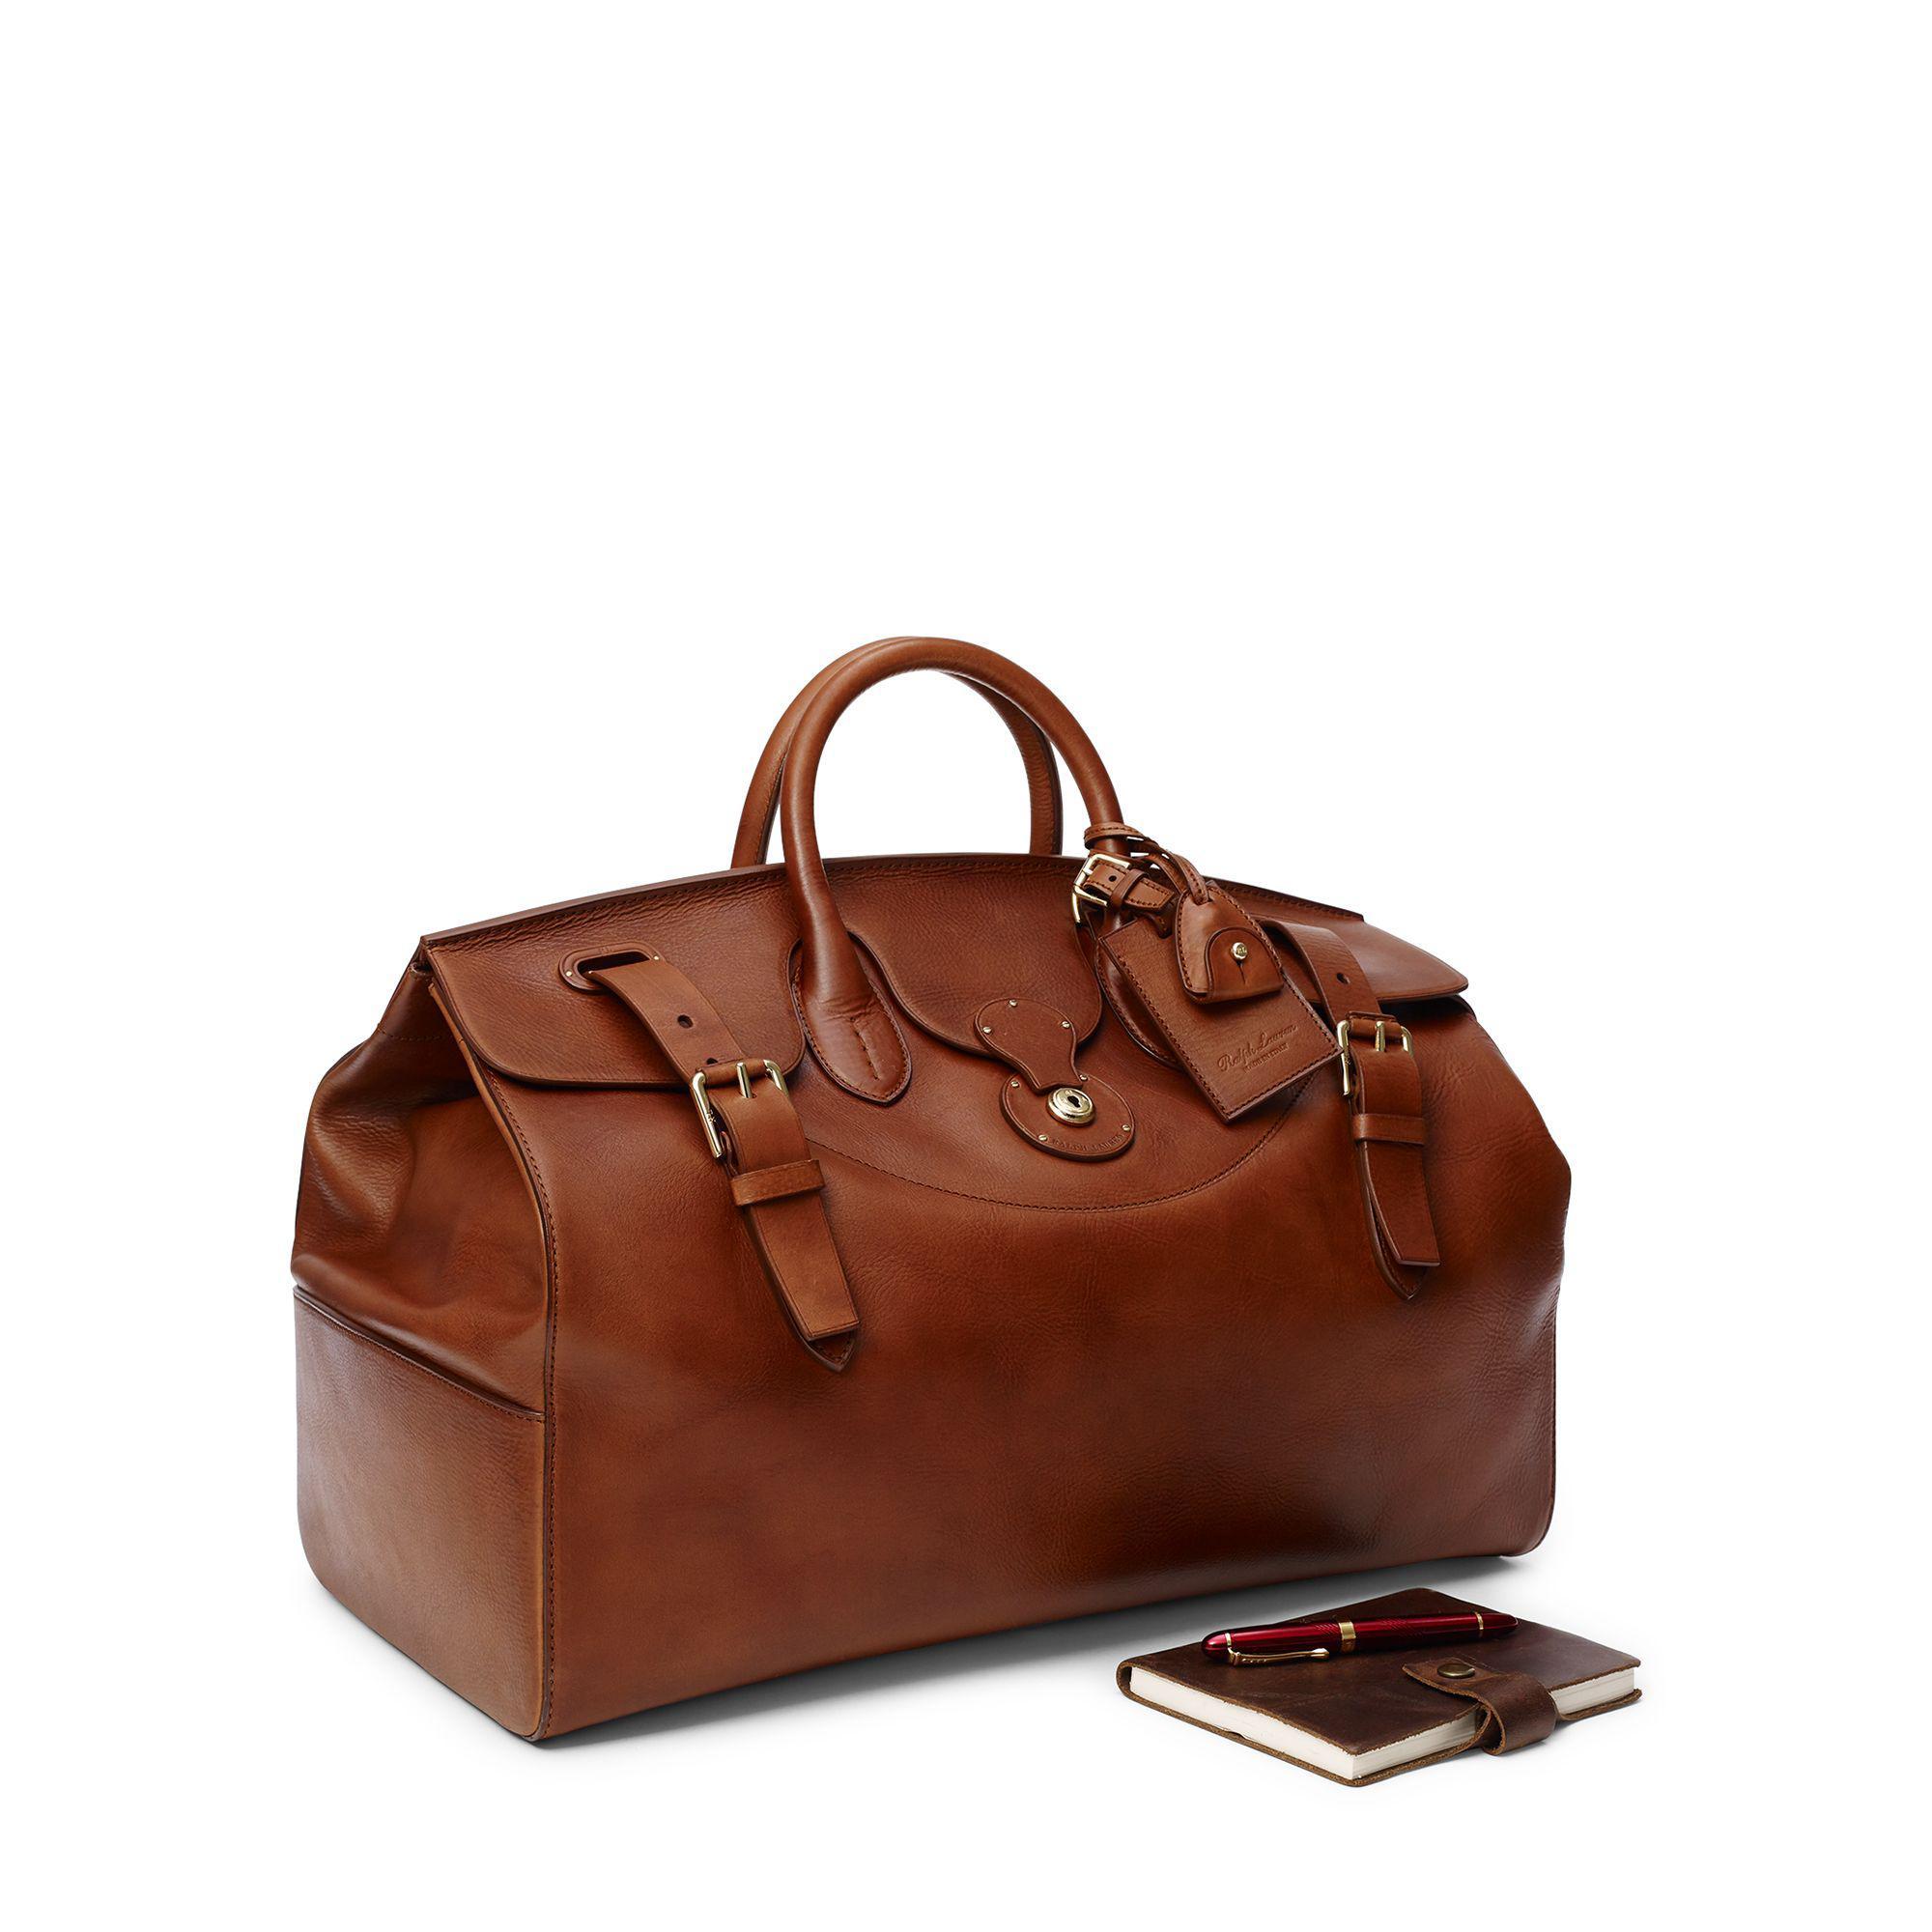 a597796573 Lyst - Ralph Lauren Vintage Vachetta Cooper 50 Bag in Brown for Men